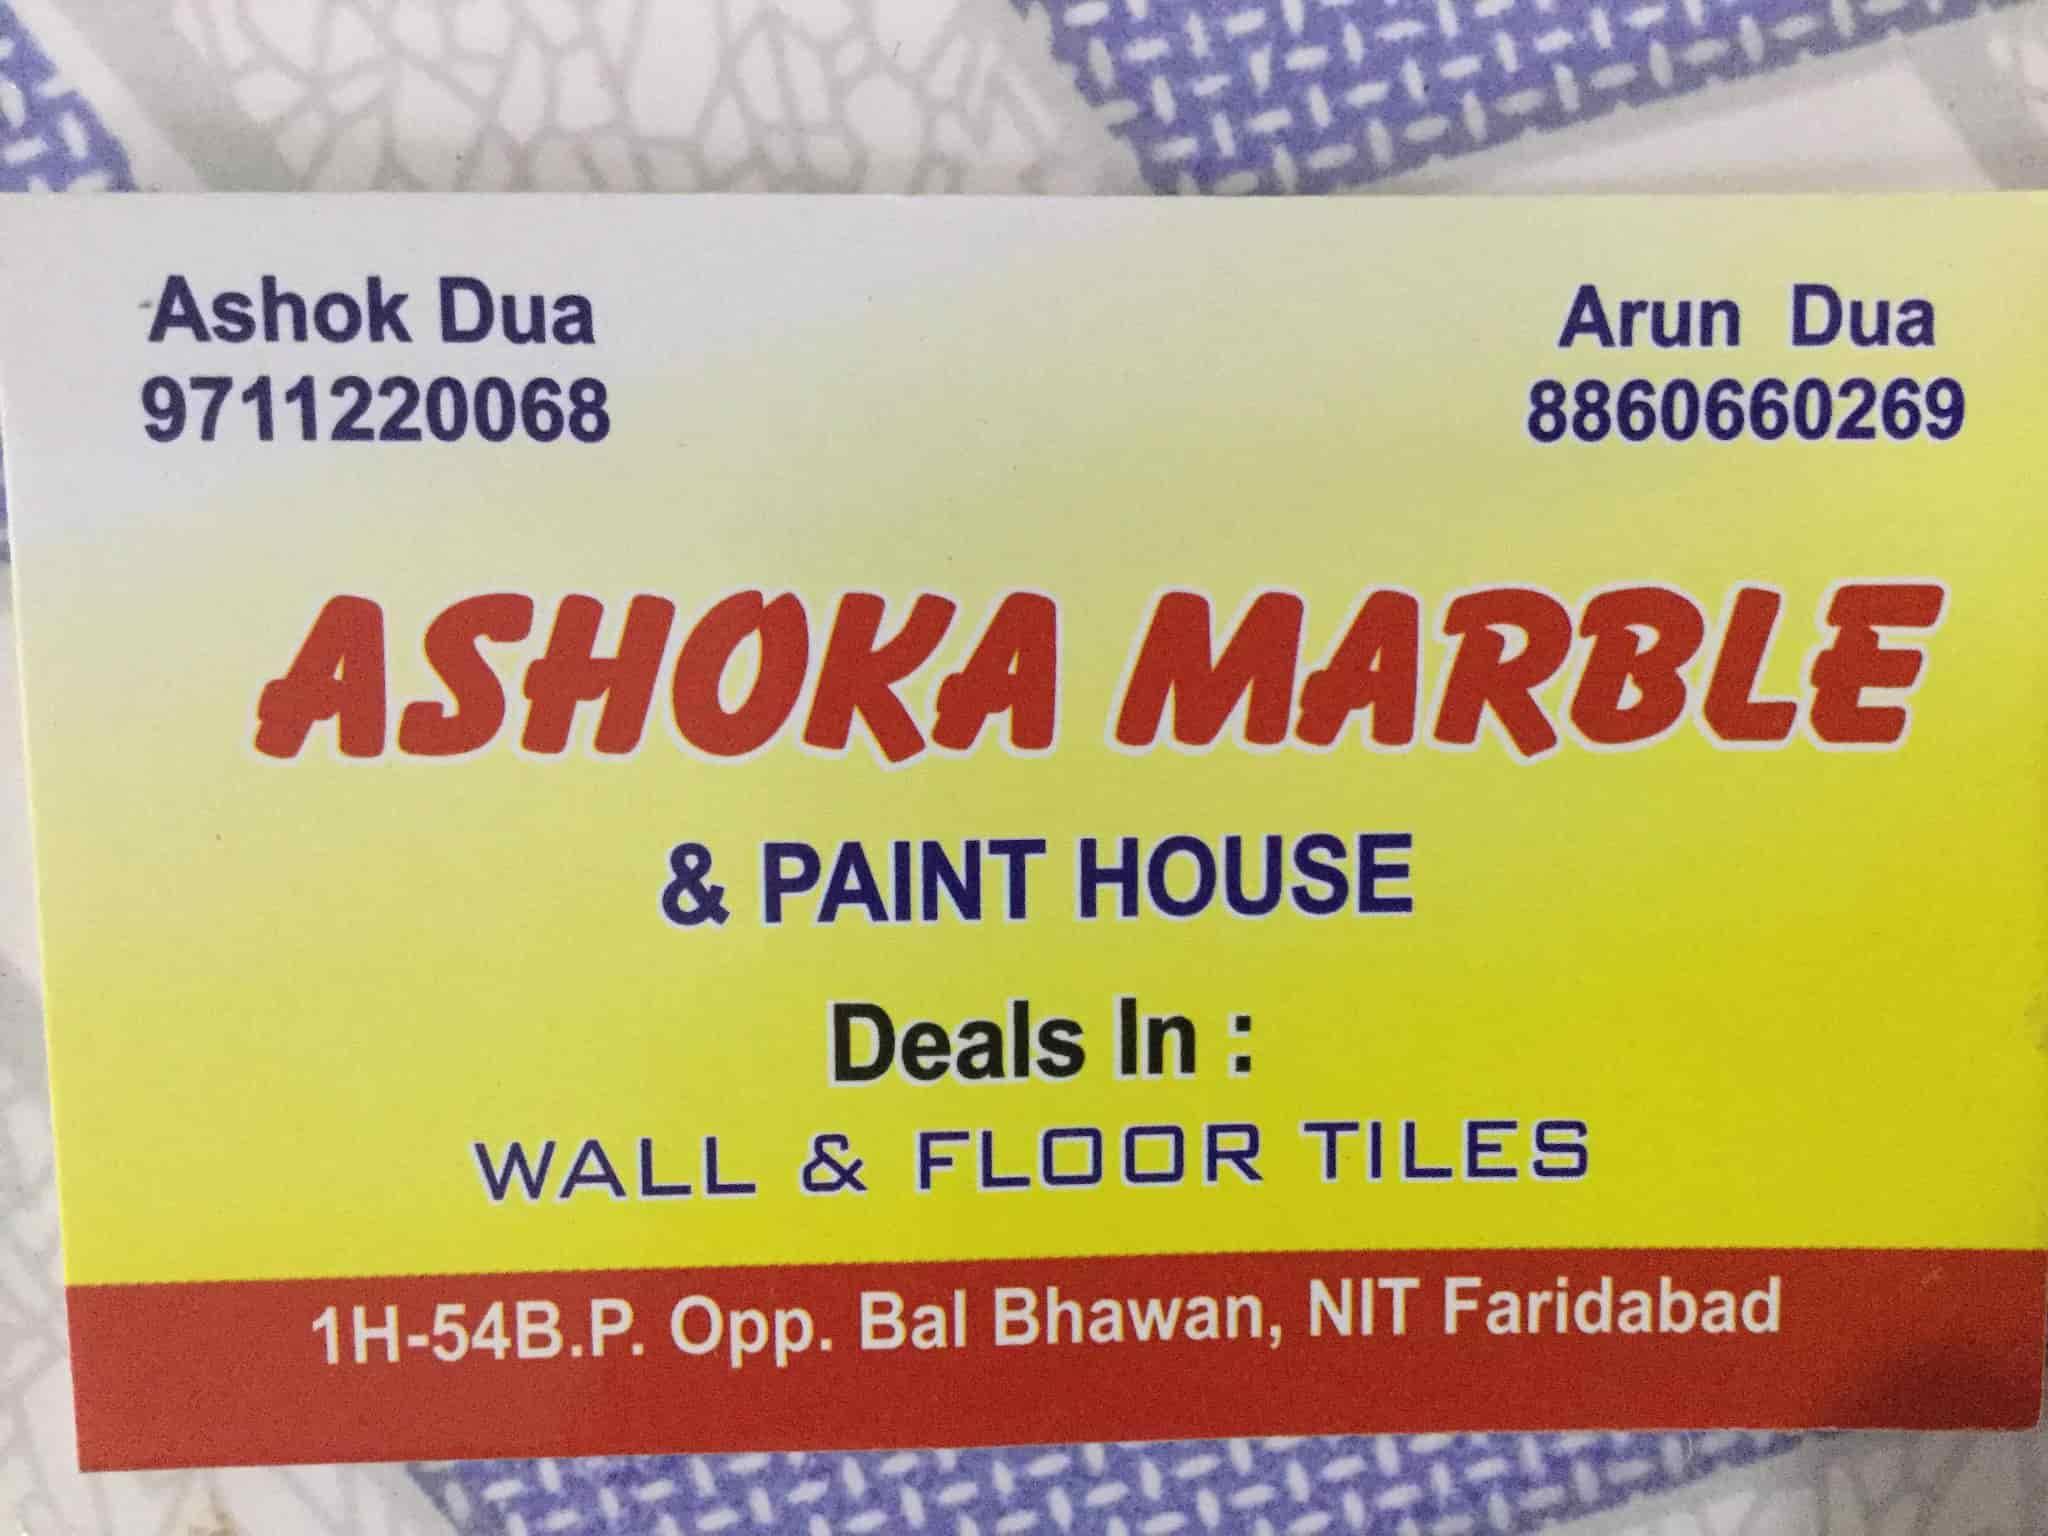 Ashoka Marble Paint House Photos, NIT, Faridabad- Pictures & Images